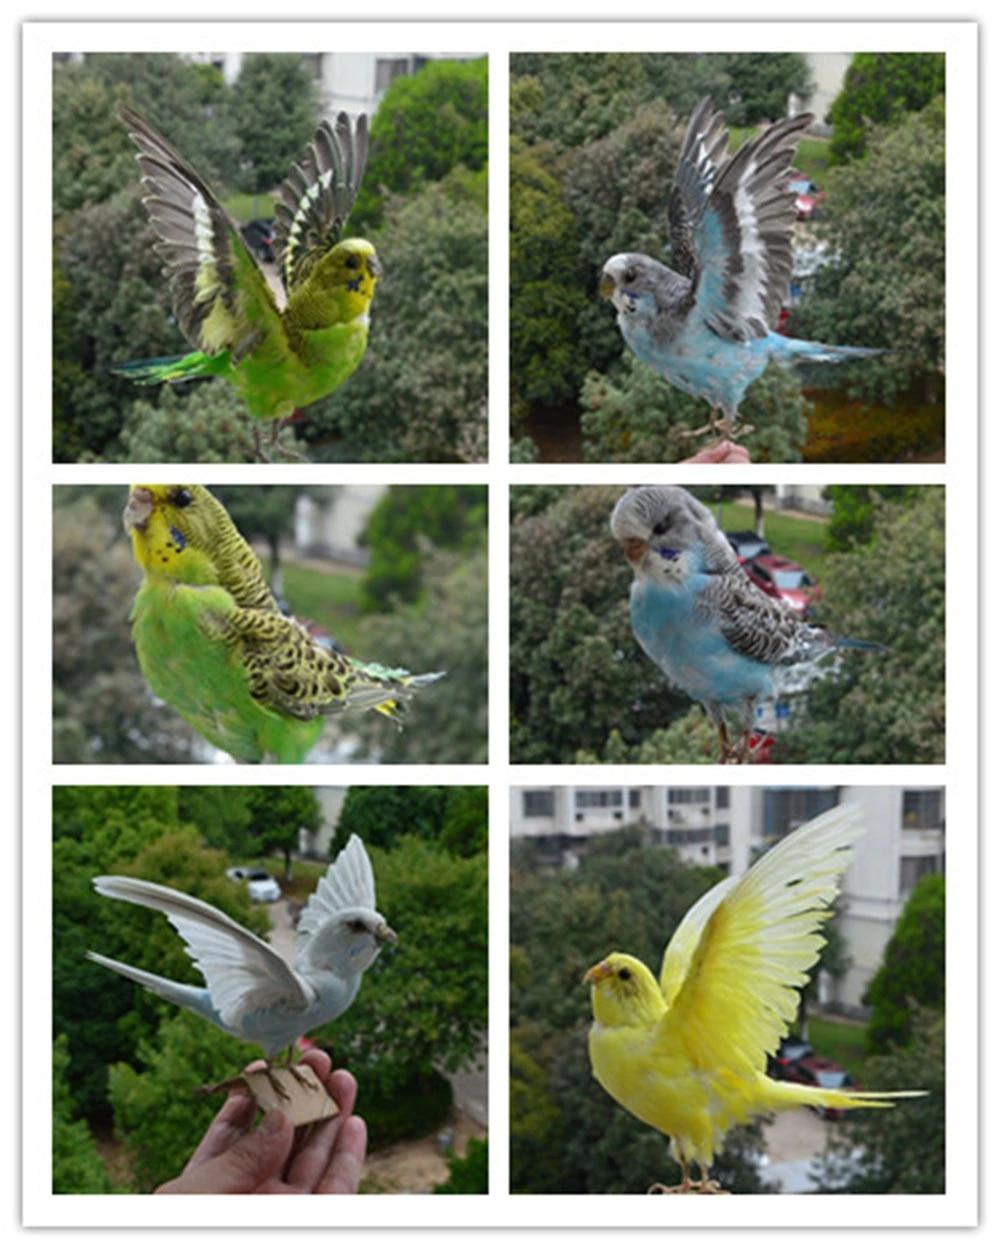 Decoration Taxidermy stuffing Eurasian Parrot specimen Teaching